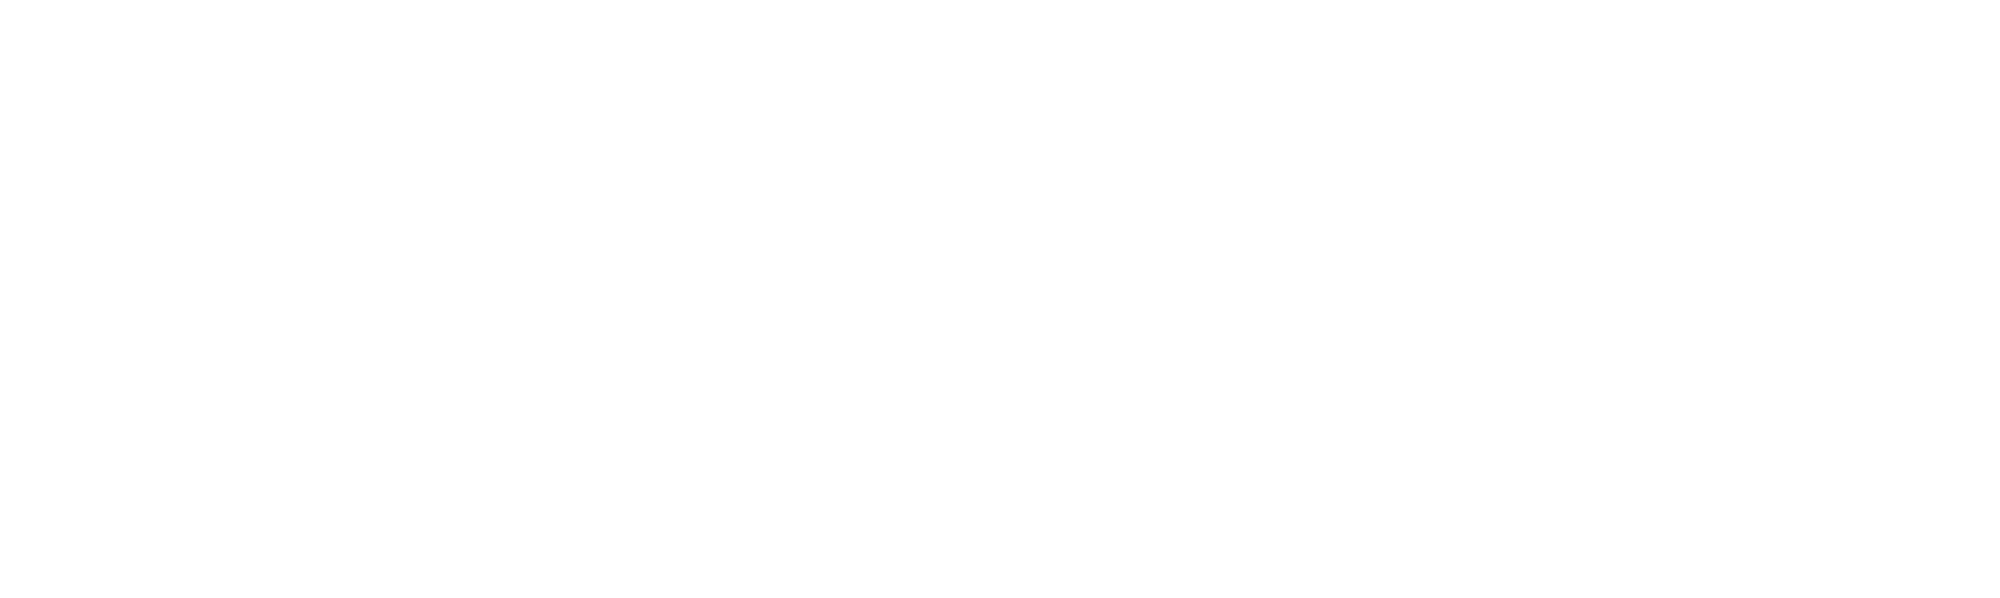 voice_logo_white_transparent.png